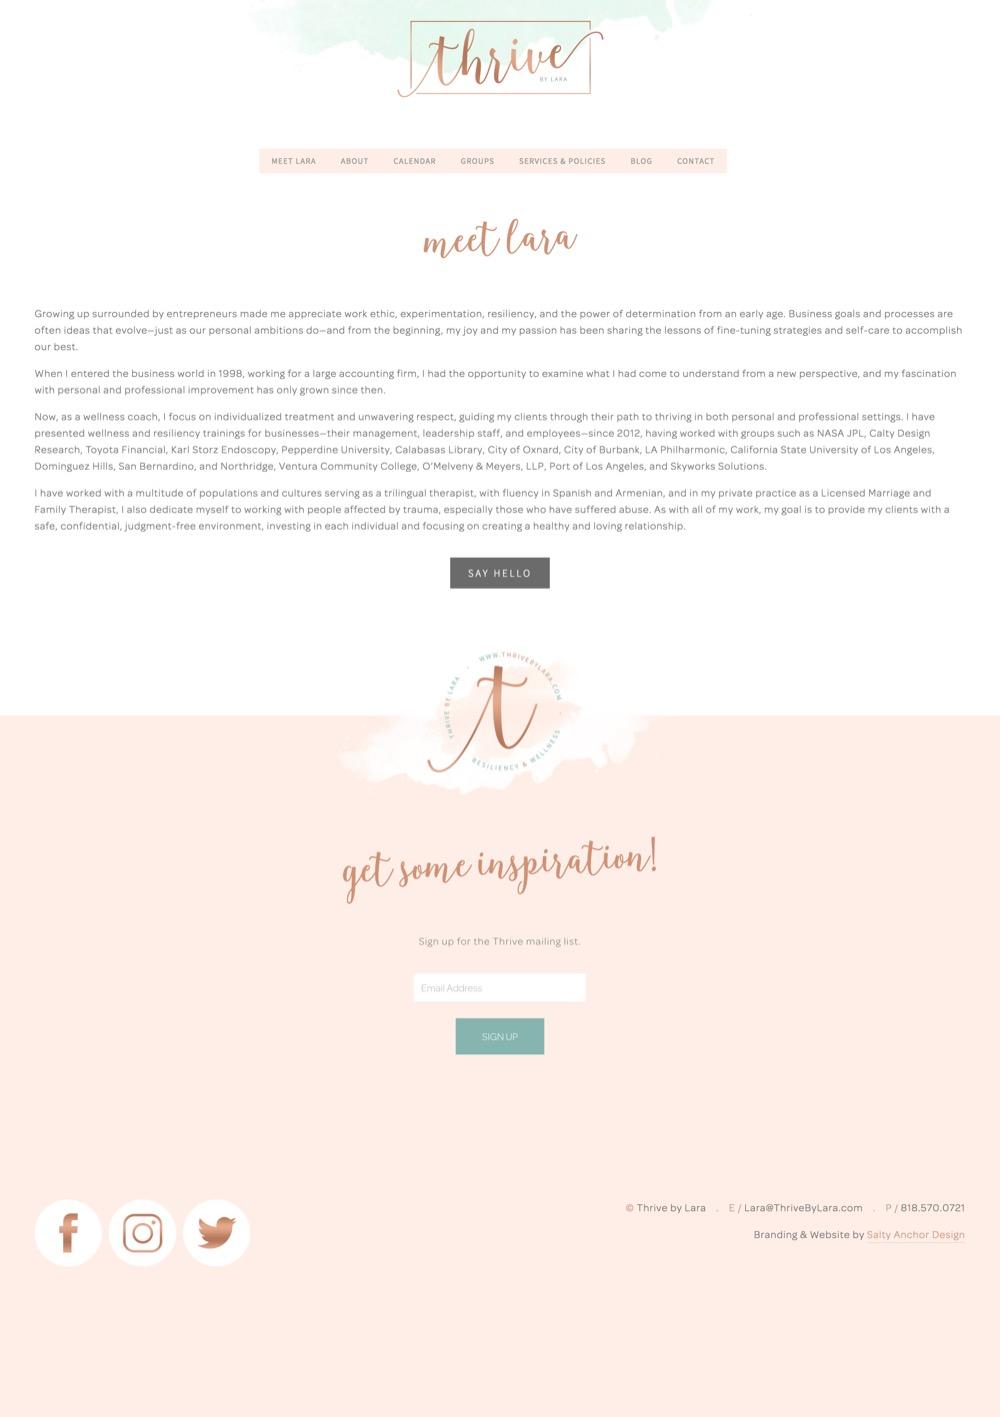 Squarespace Website Design Secondary Content Page